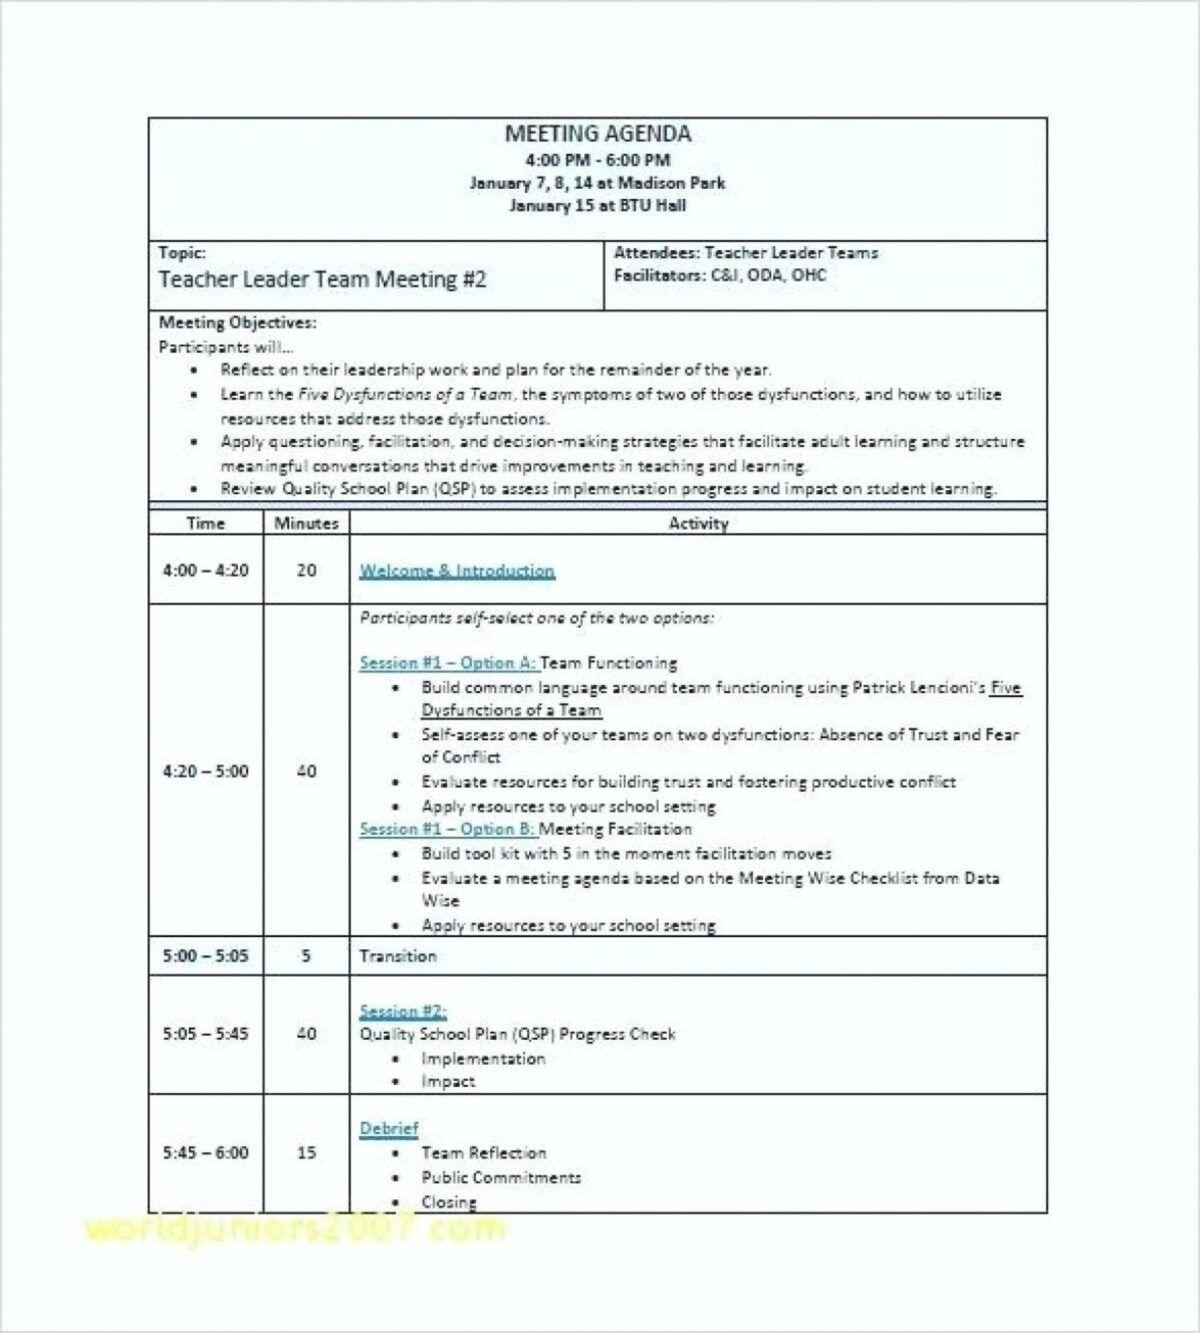 12 13 Word Agenda Vorlage Fur Meetings Ithacar Throughout Event Agenda Template Word In 2020 Meeting Notes Template Meeting Agenda Template Agenda Template